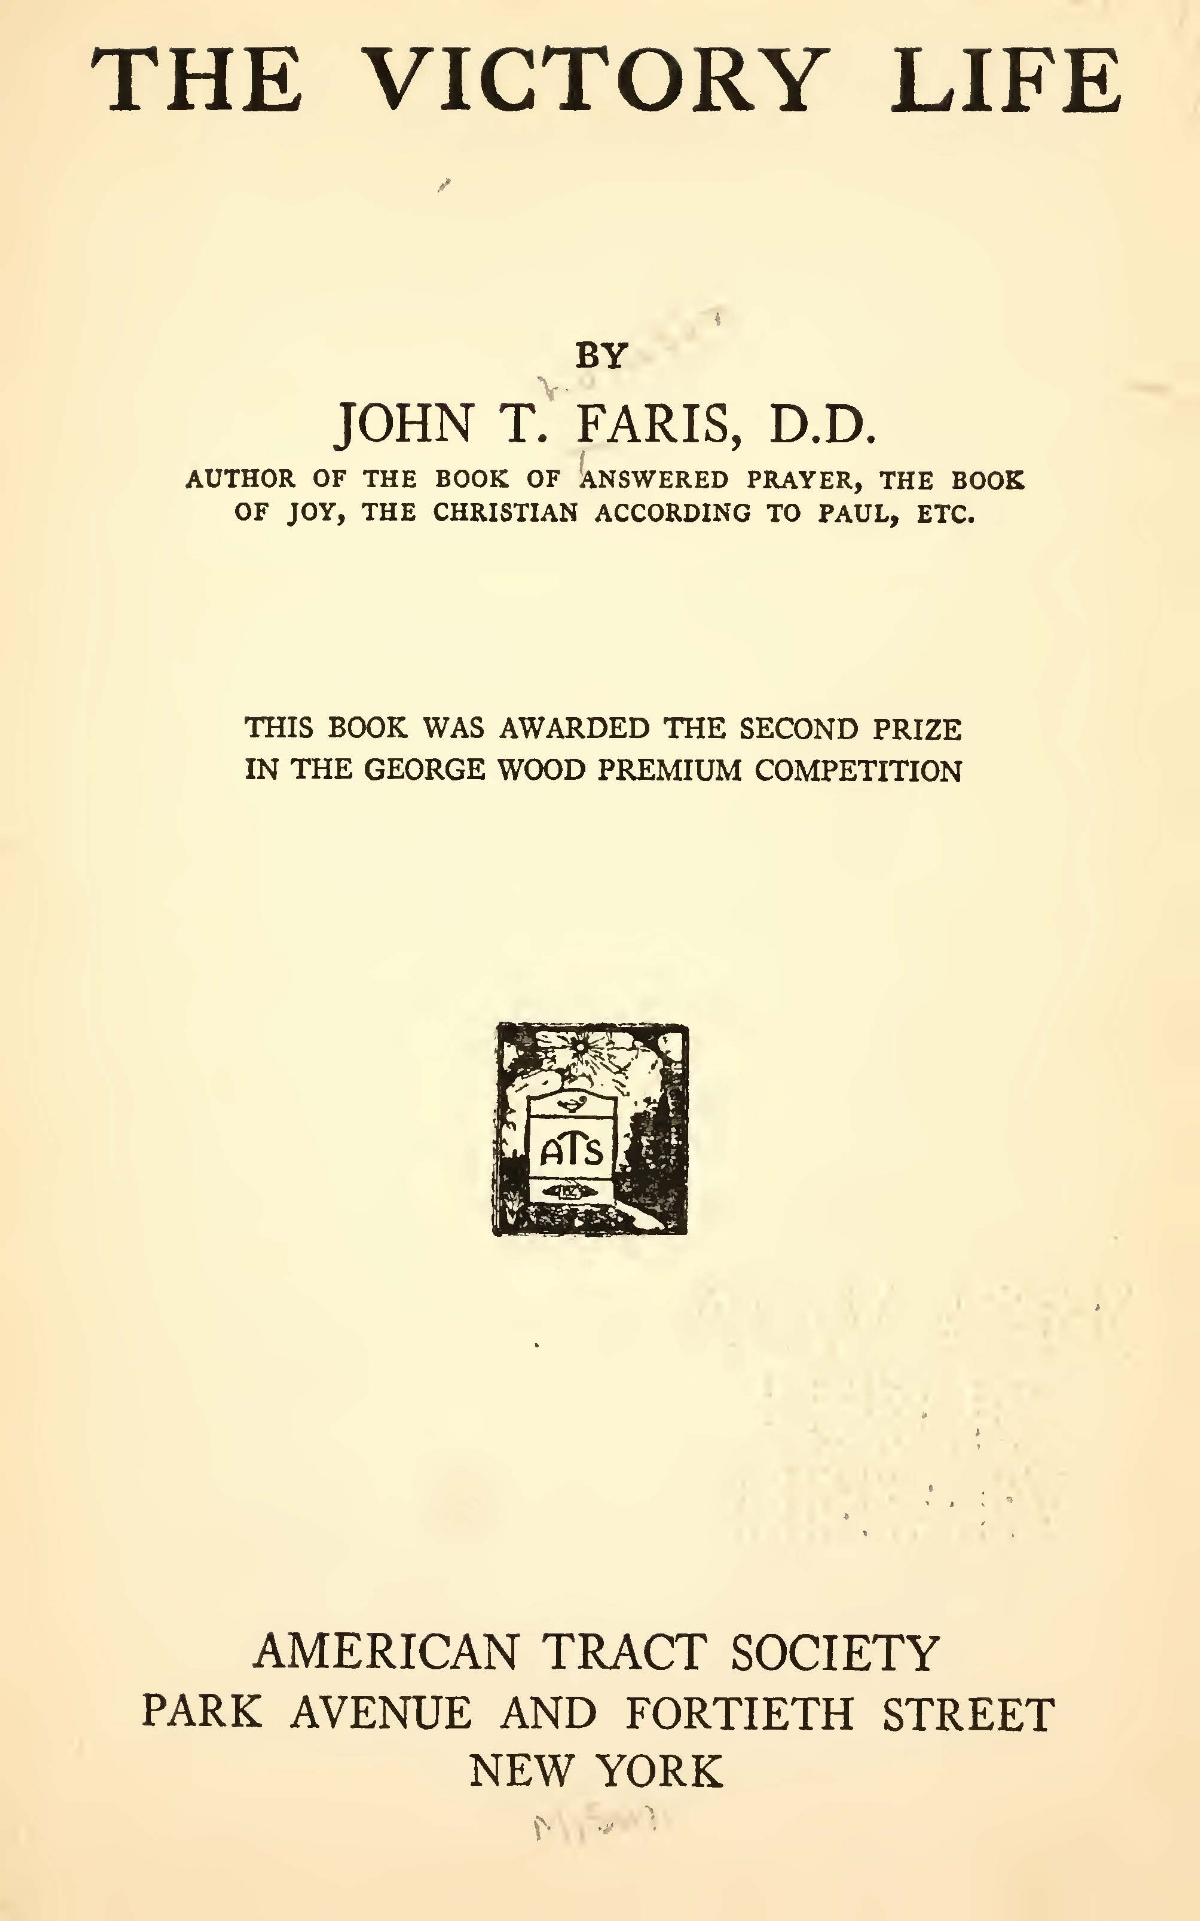 Faris, John Thomson, The Victory Life Title Page.jpg